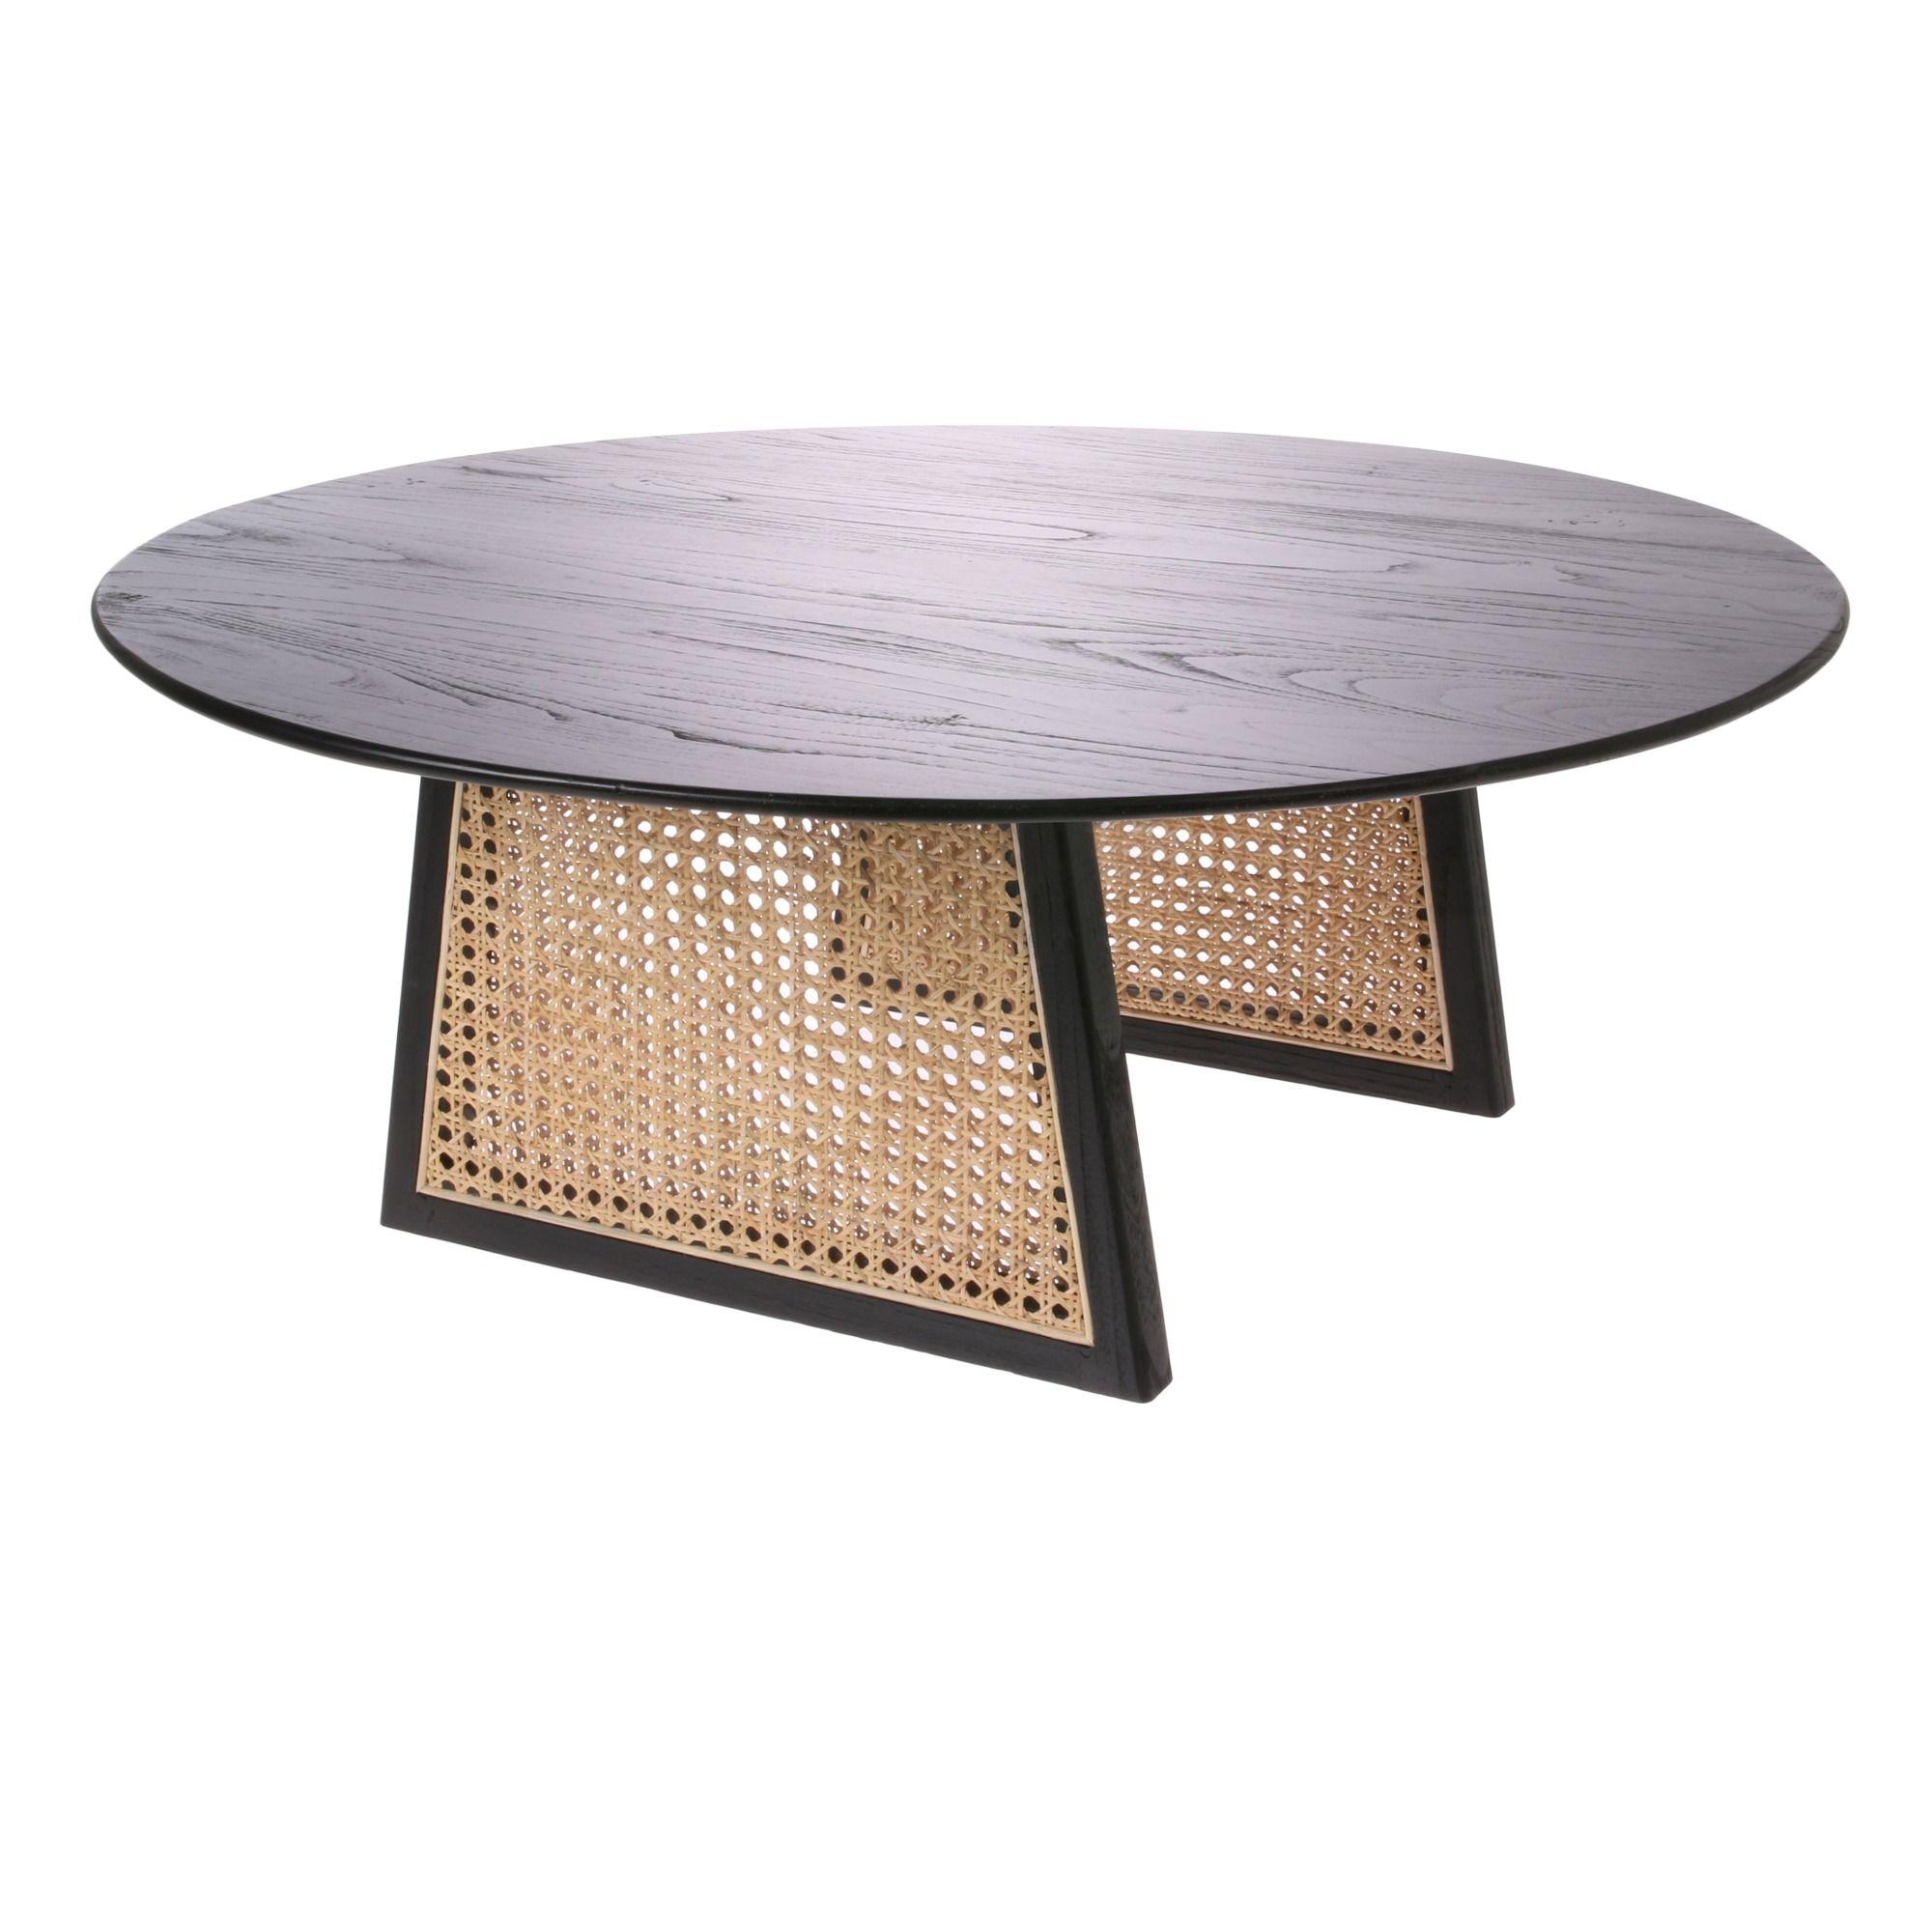 Pin On Furniture Inspo [ 2000 x 2000 Pixel ]